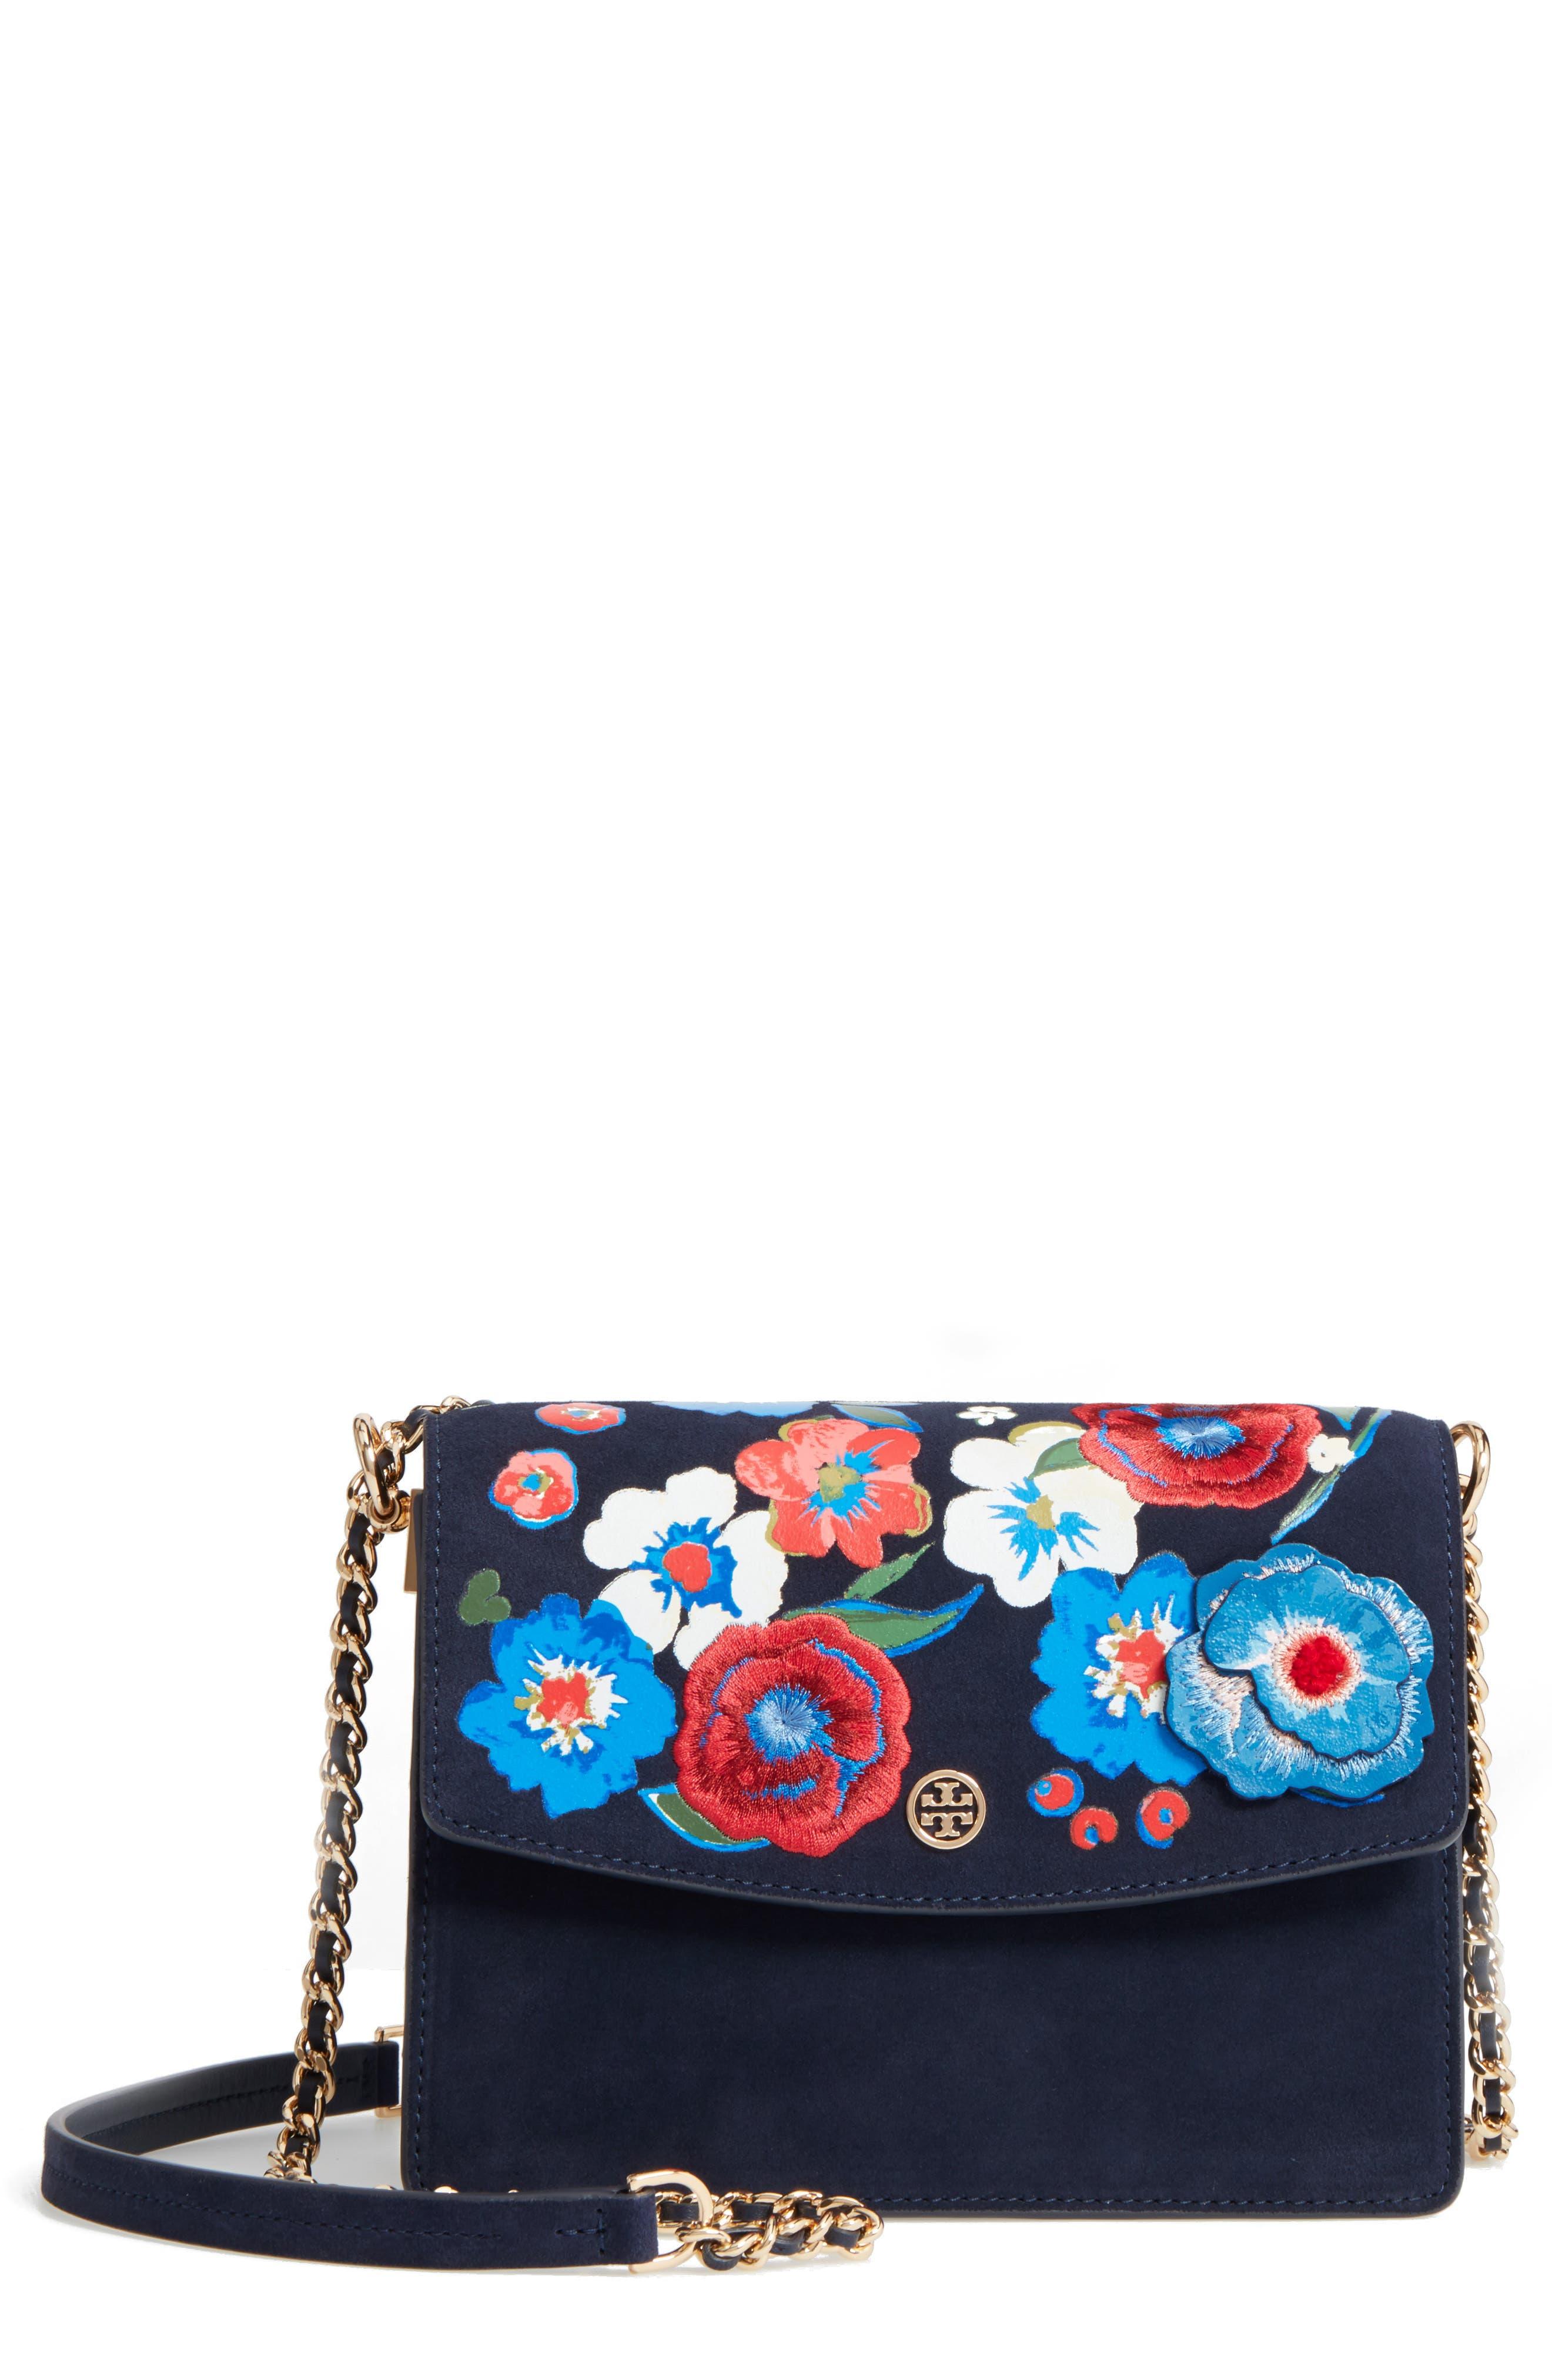 Tory Burch Parker Flower Embroidered Leather Shoulder/Crossbody Bag